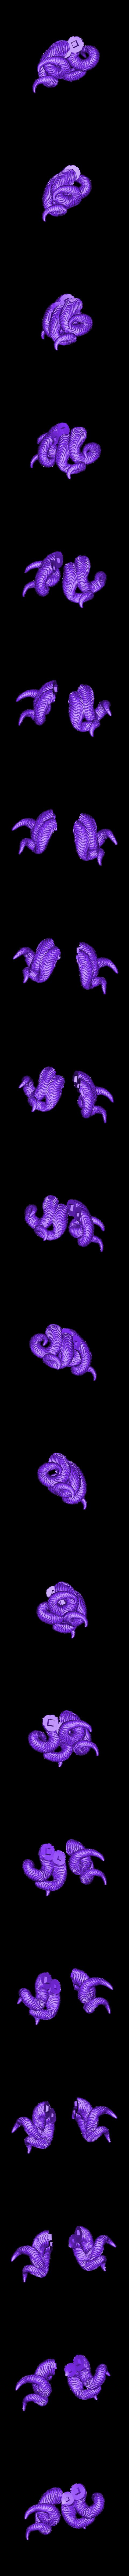 Female_horns_horns.stl Download free STL file Horned female • 3D printable object, duncanshadow